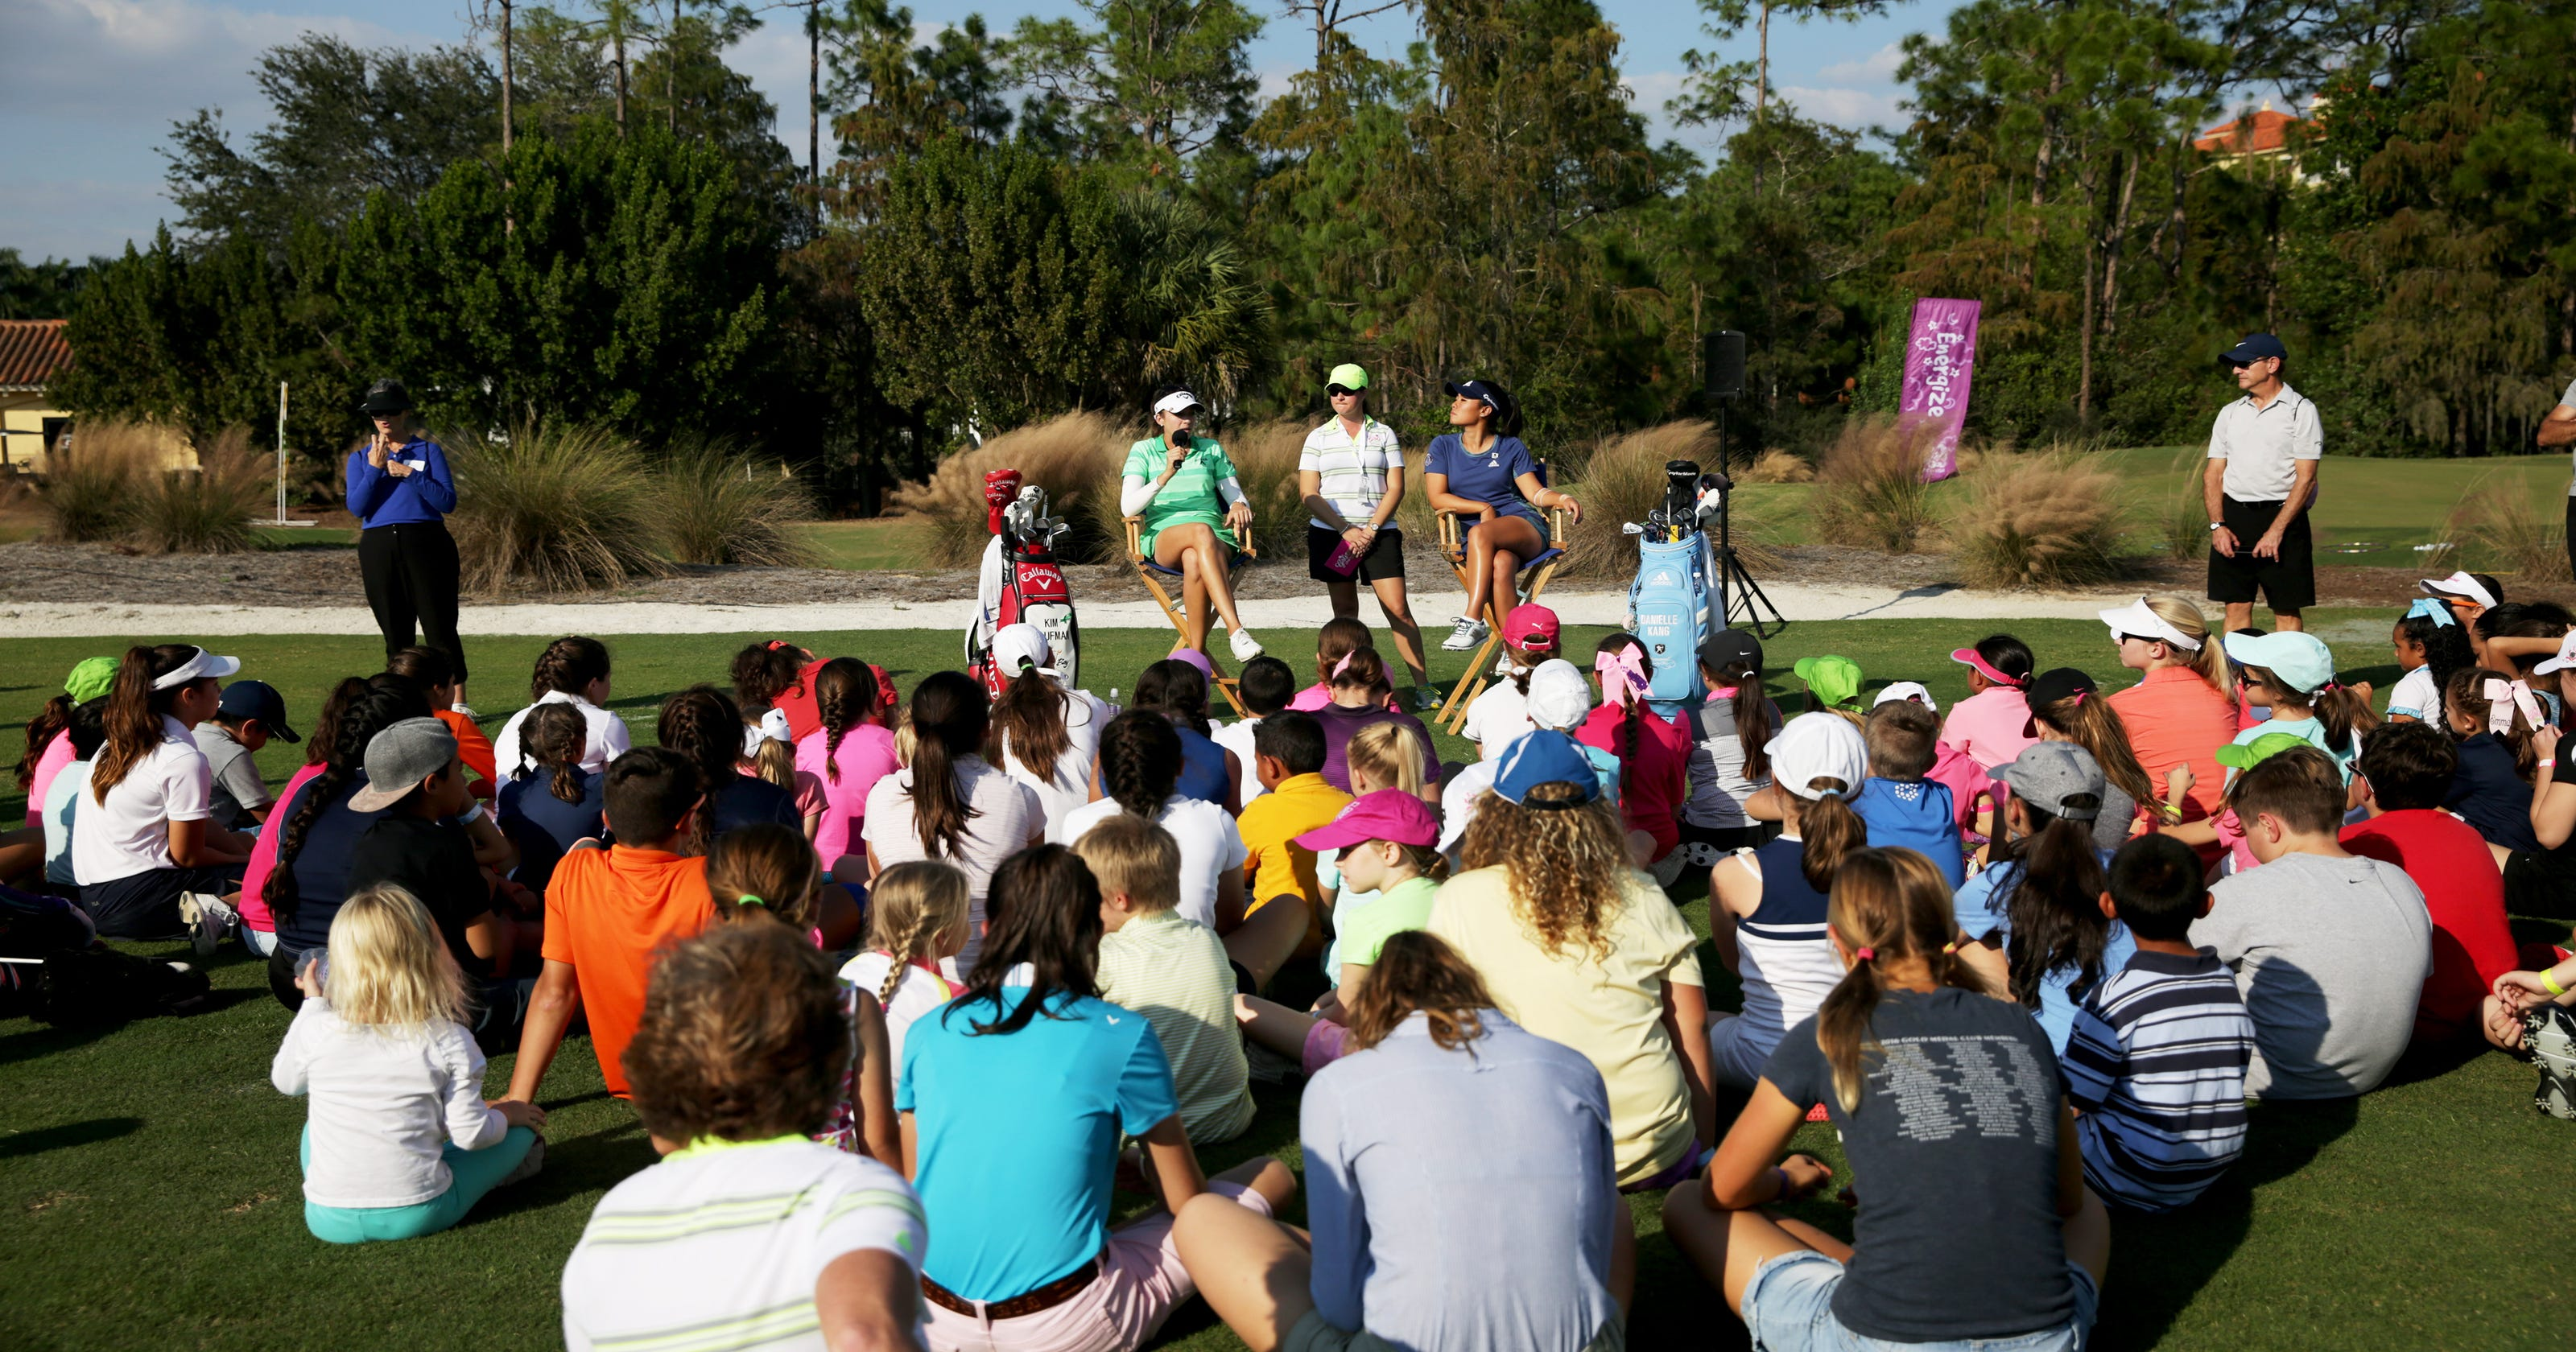 CME Group Tour Championship notebook: Juniors enjoy free